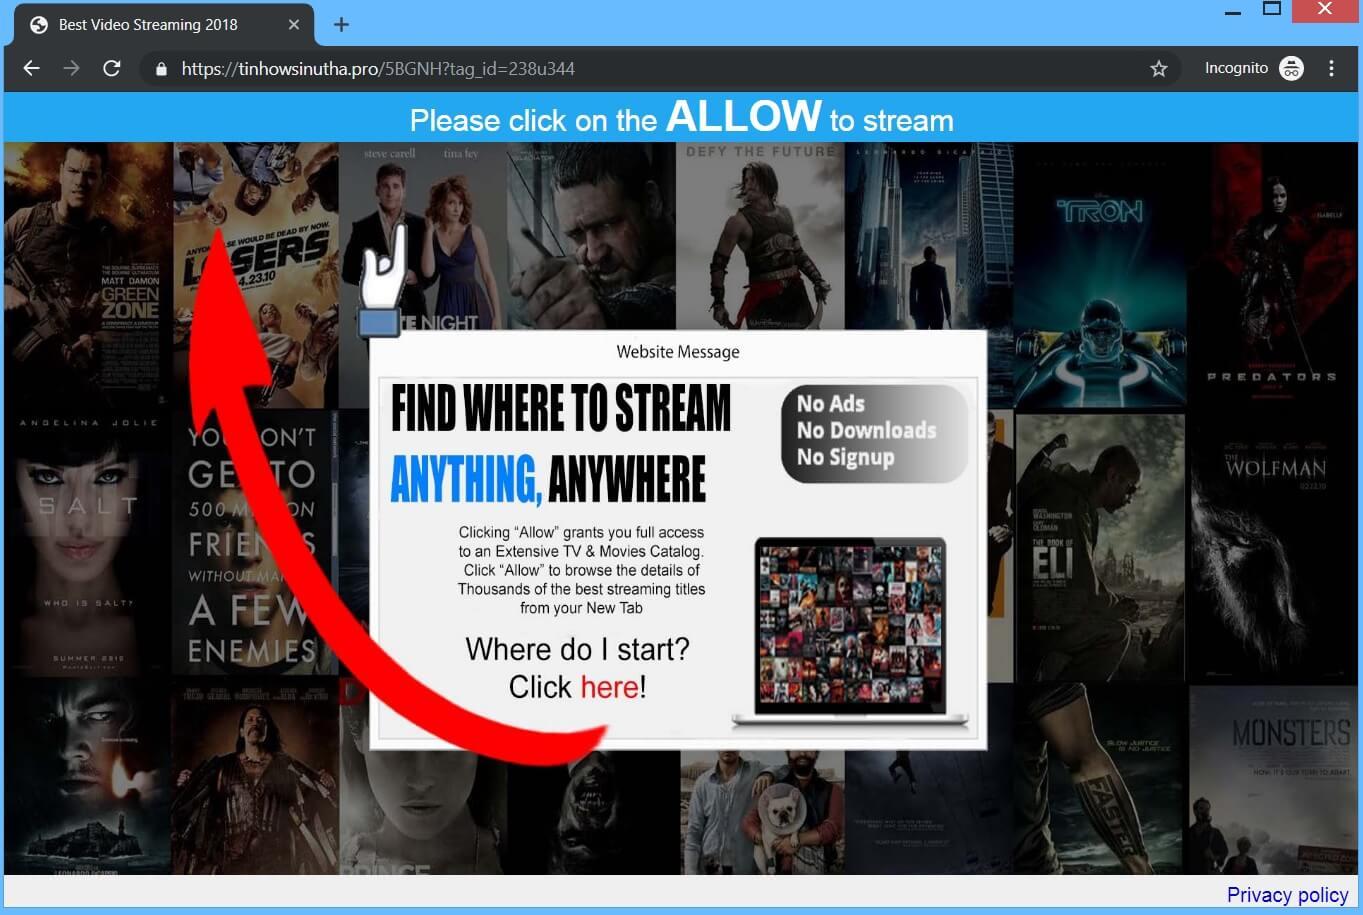 Tinhowsinutha.pro Redirect remove